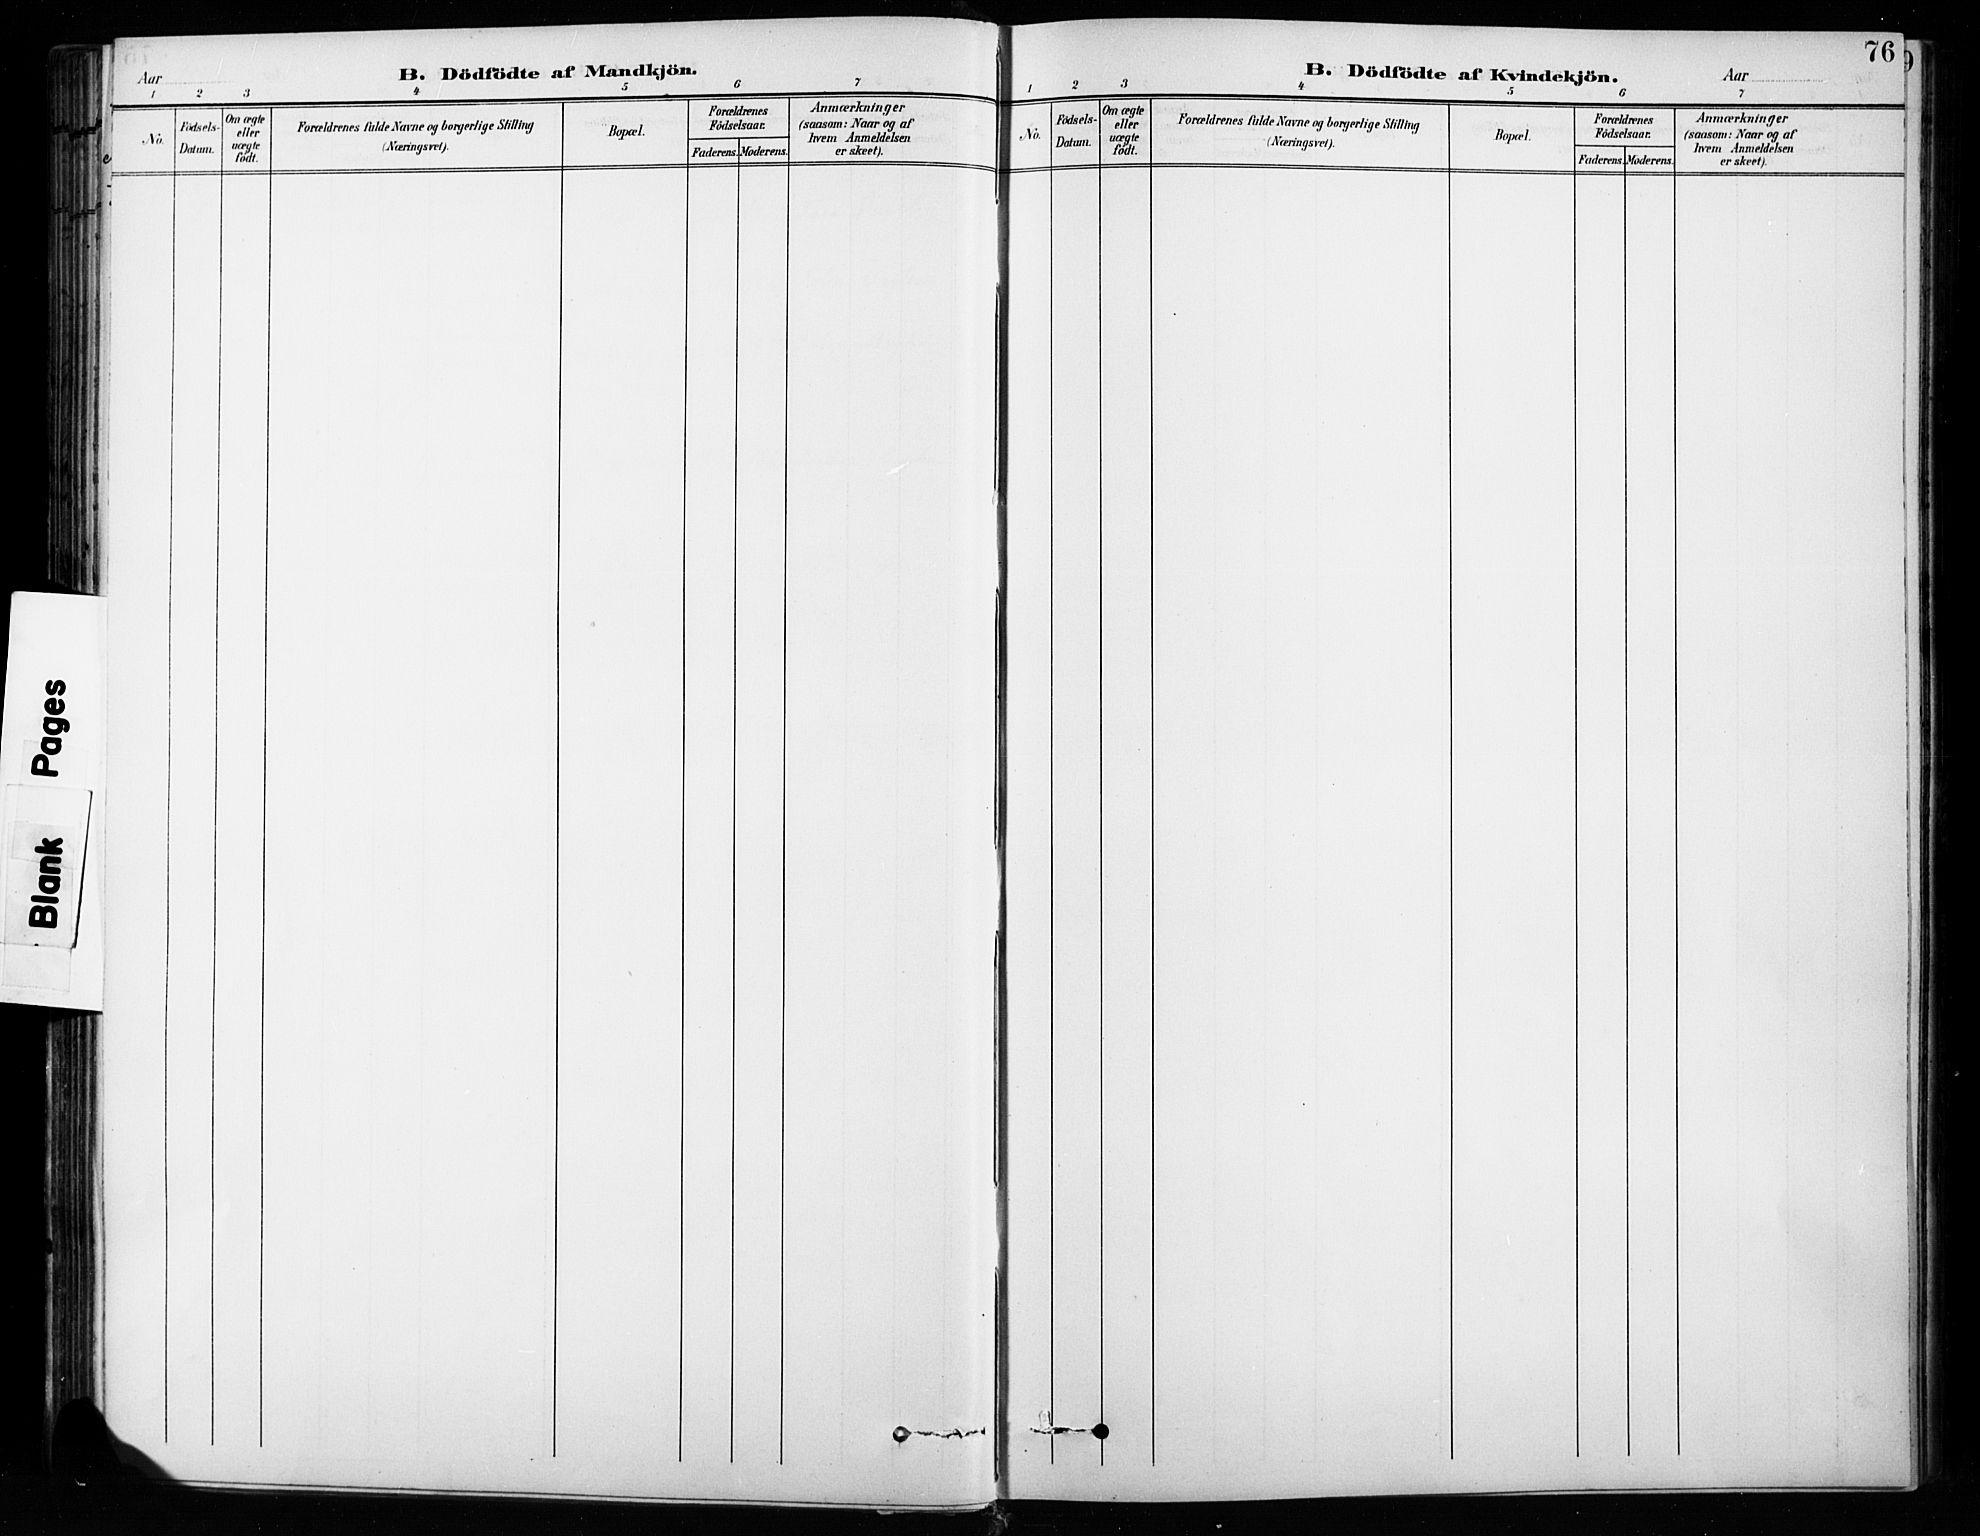 SAH, Vardal prestekontor, H/Ha/Hab/L0010: Klokkerbok nr. 10, 1895-1903, s. 76